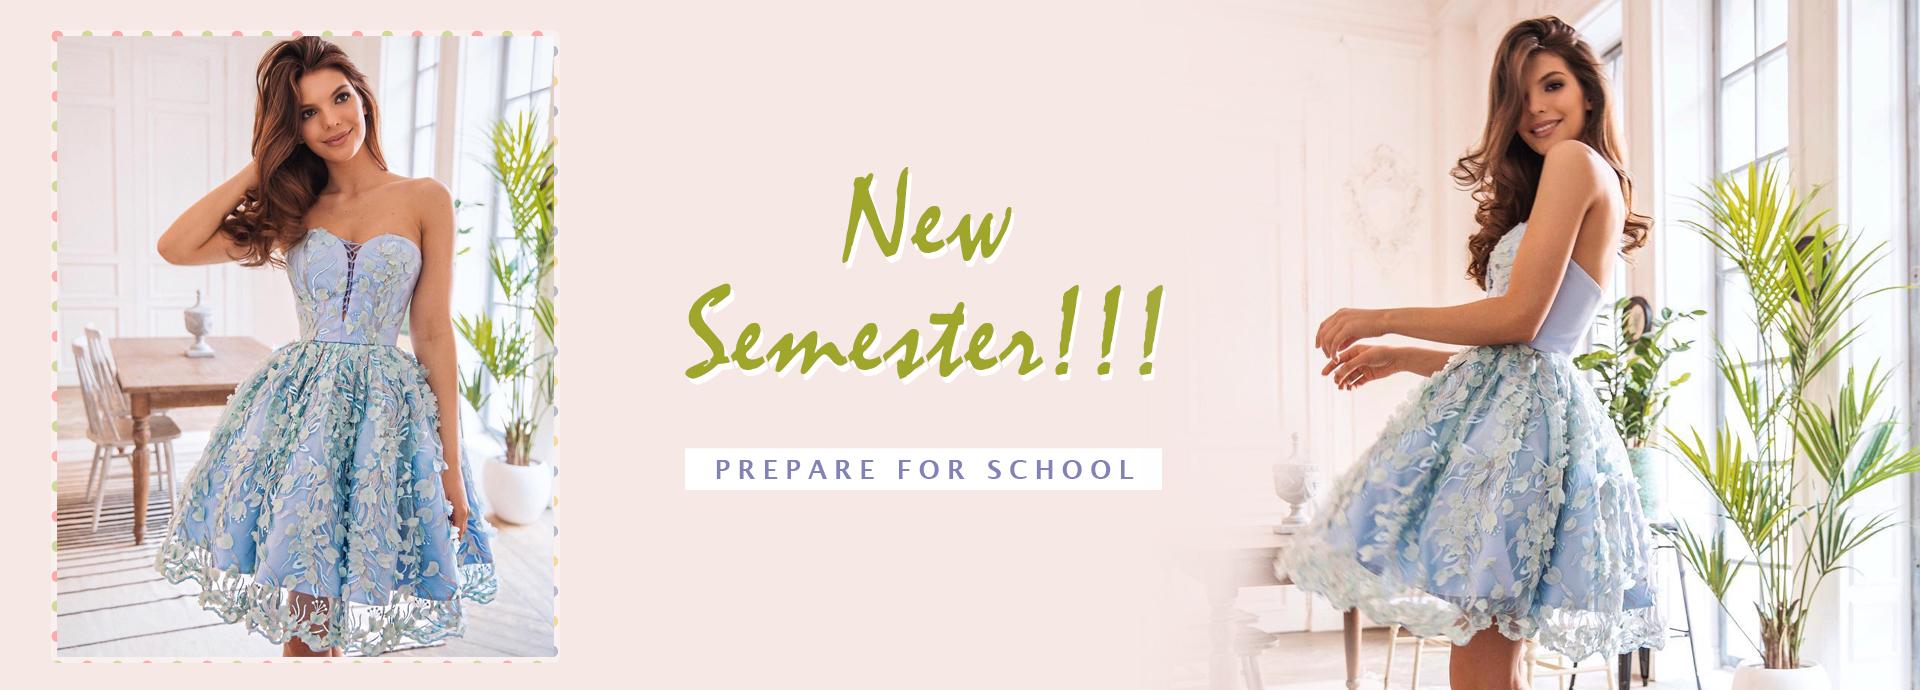 New Semester